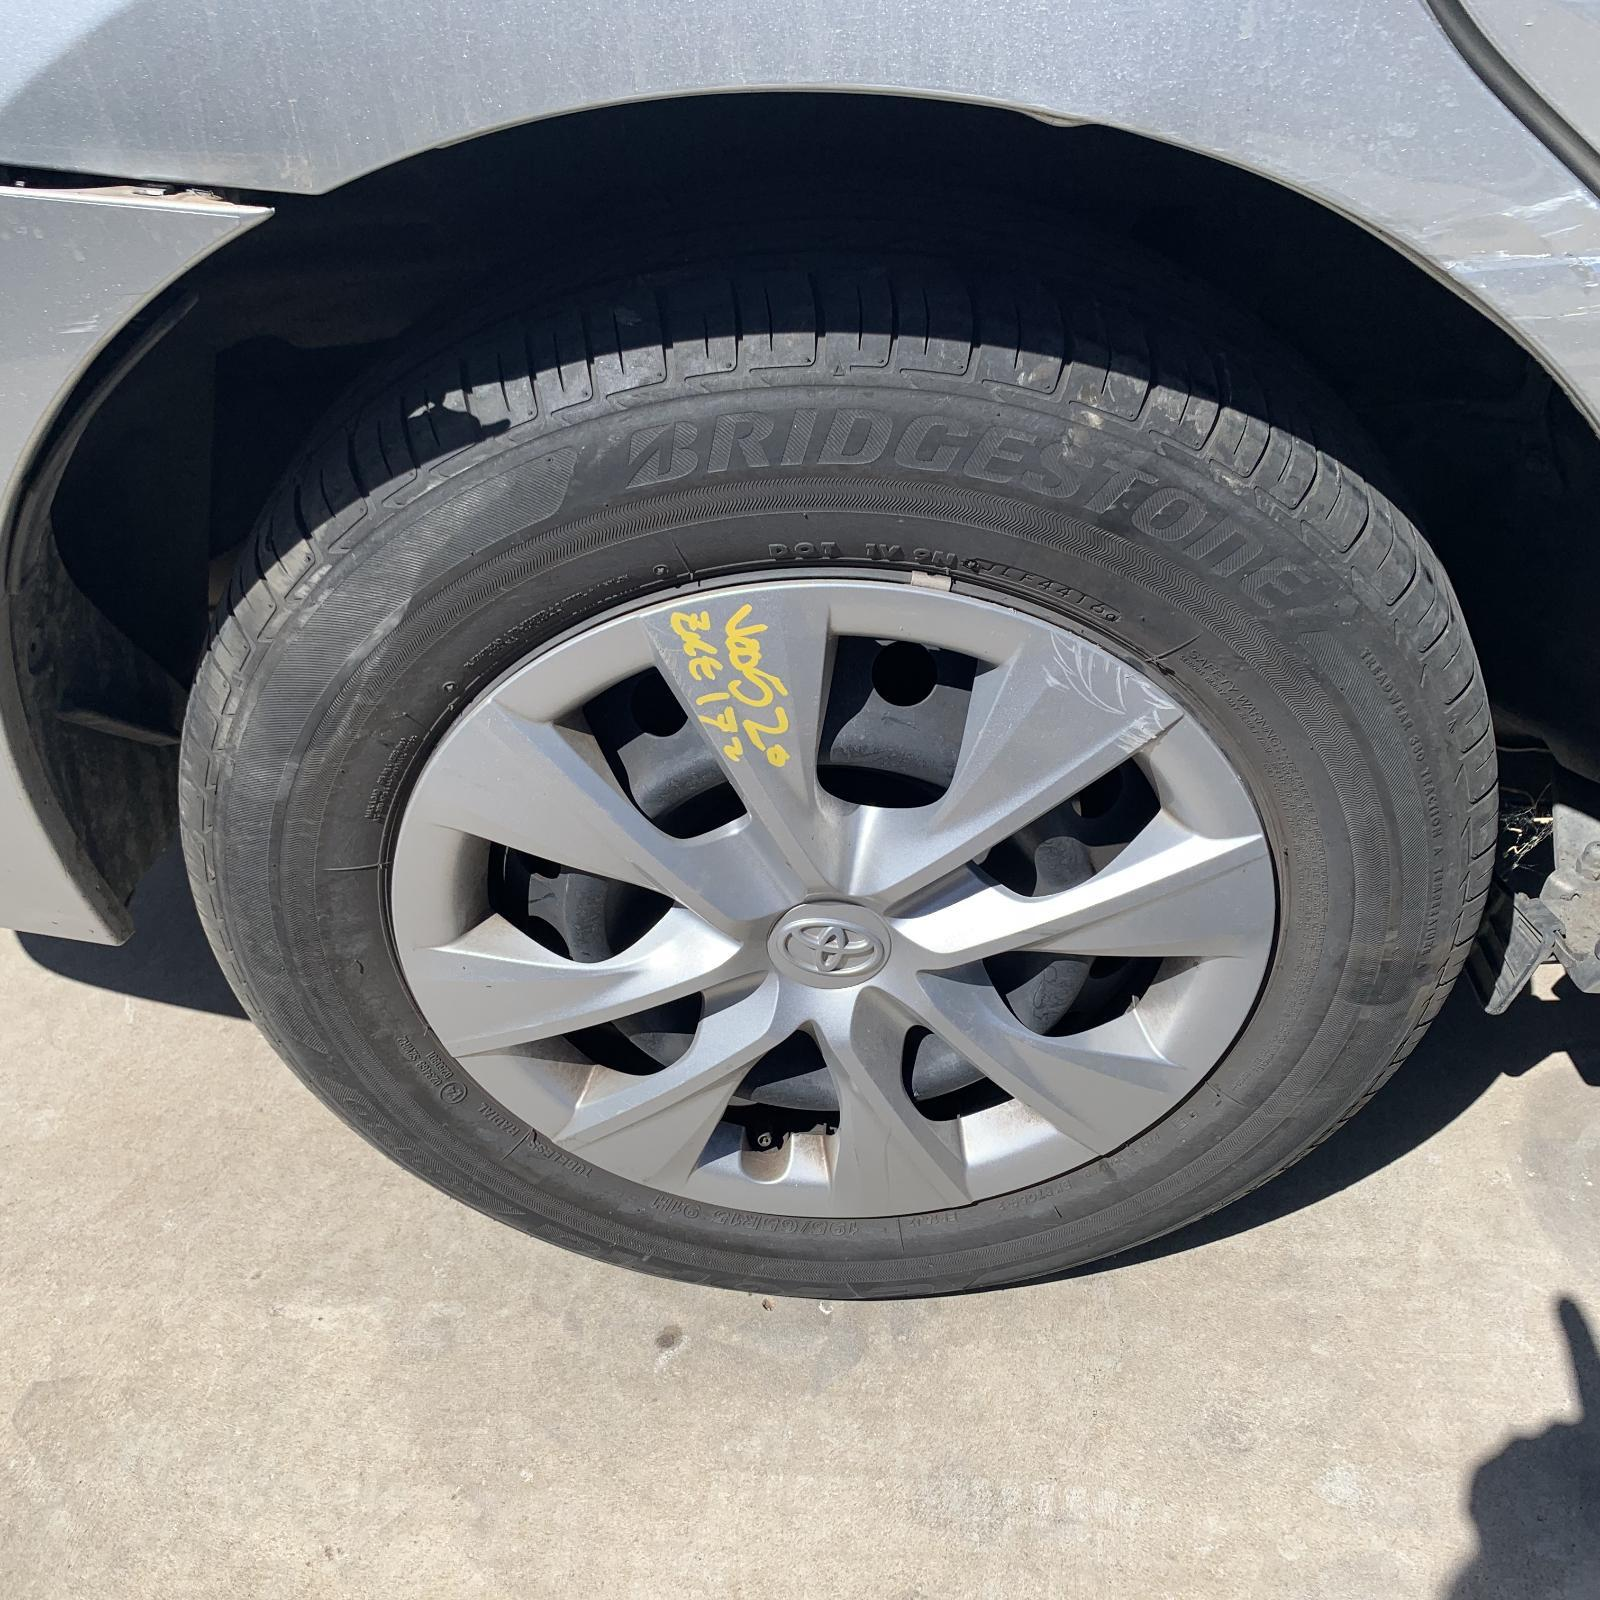 TOYOTA COROLLA, Wheel Cover/Hub Cap, ZRE172R, SEDAN, 12/13-